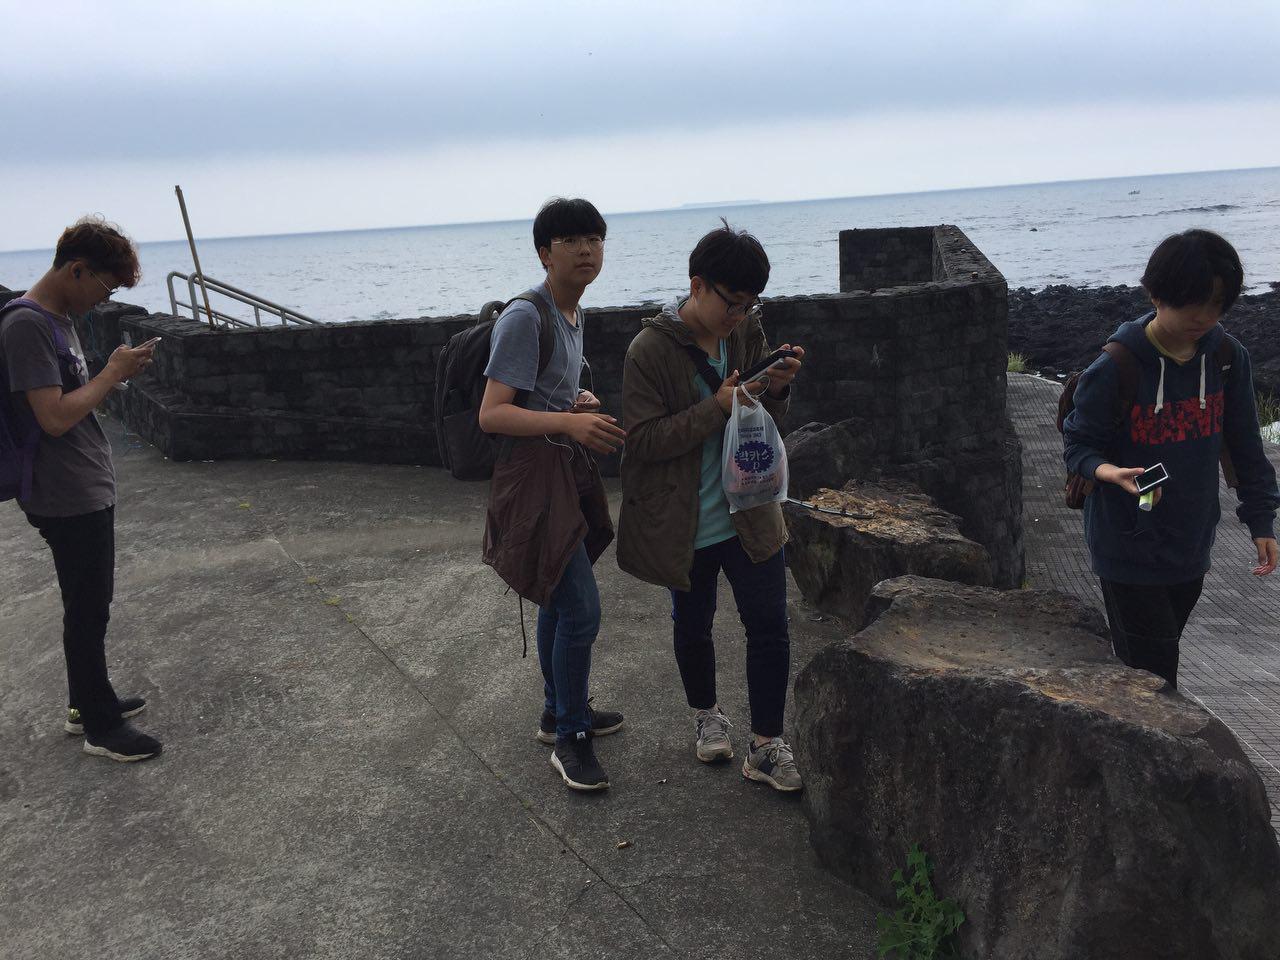 photo_2017-05-31_15-39-52.jpg